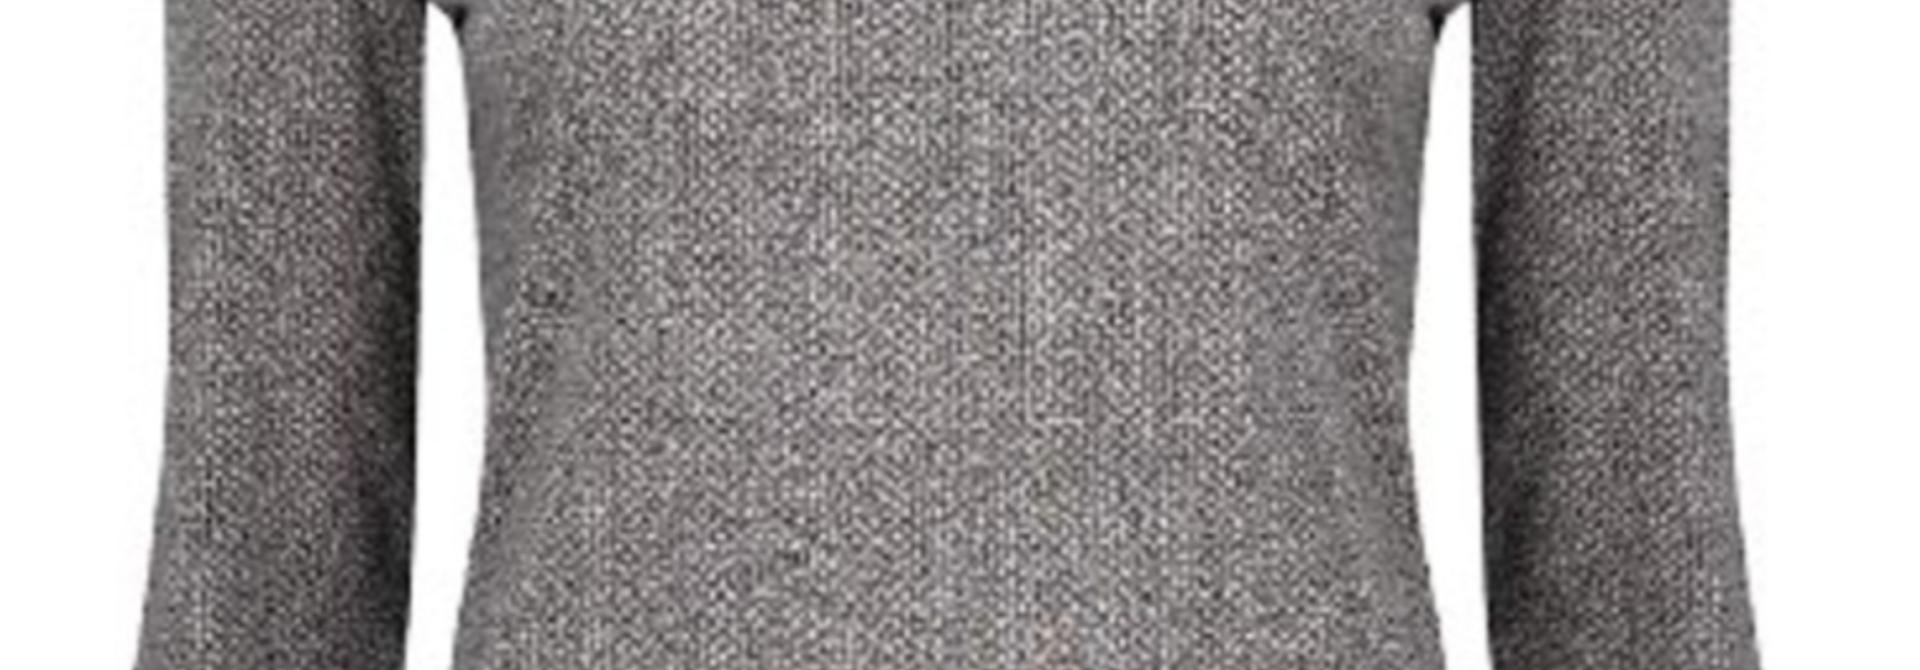 Roux print lurex